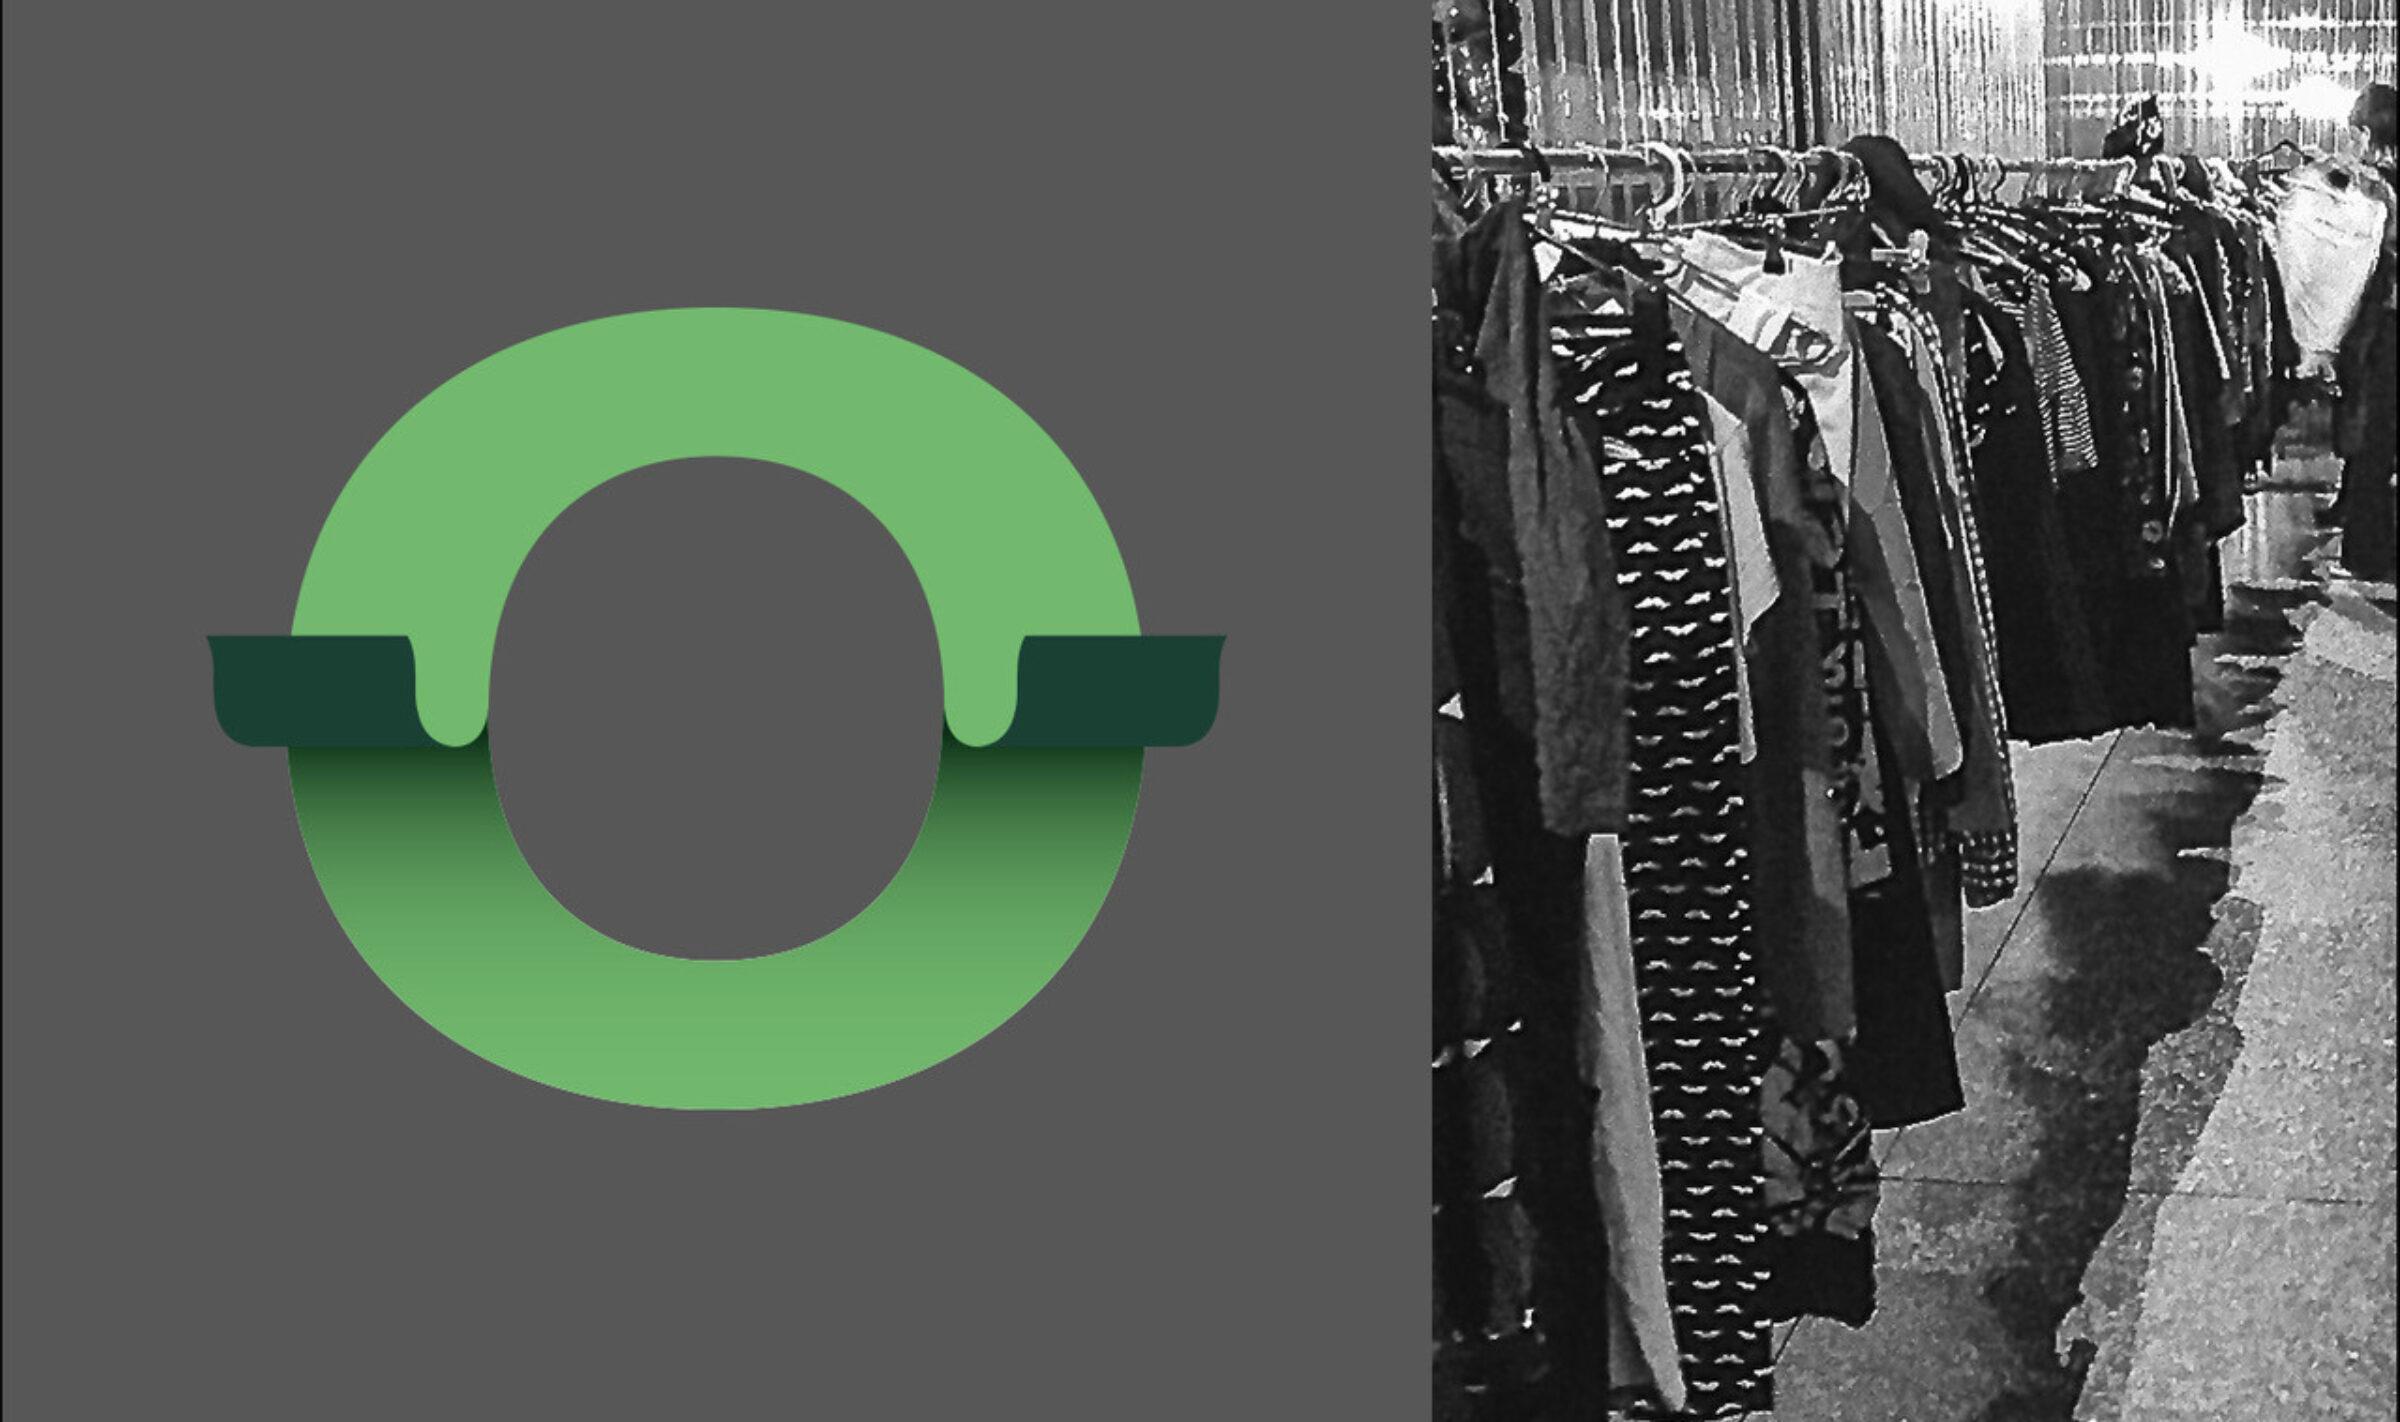 Overlap Pop Up Clothes Swap Store